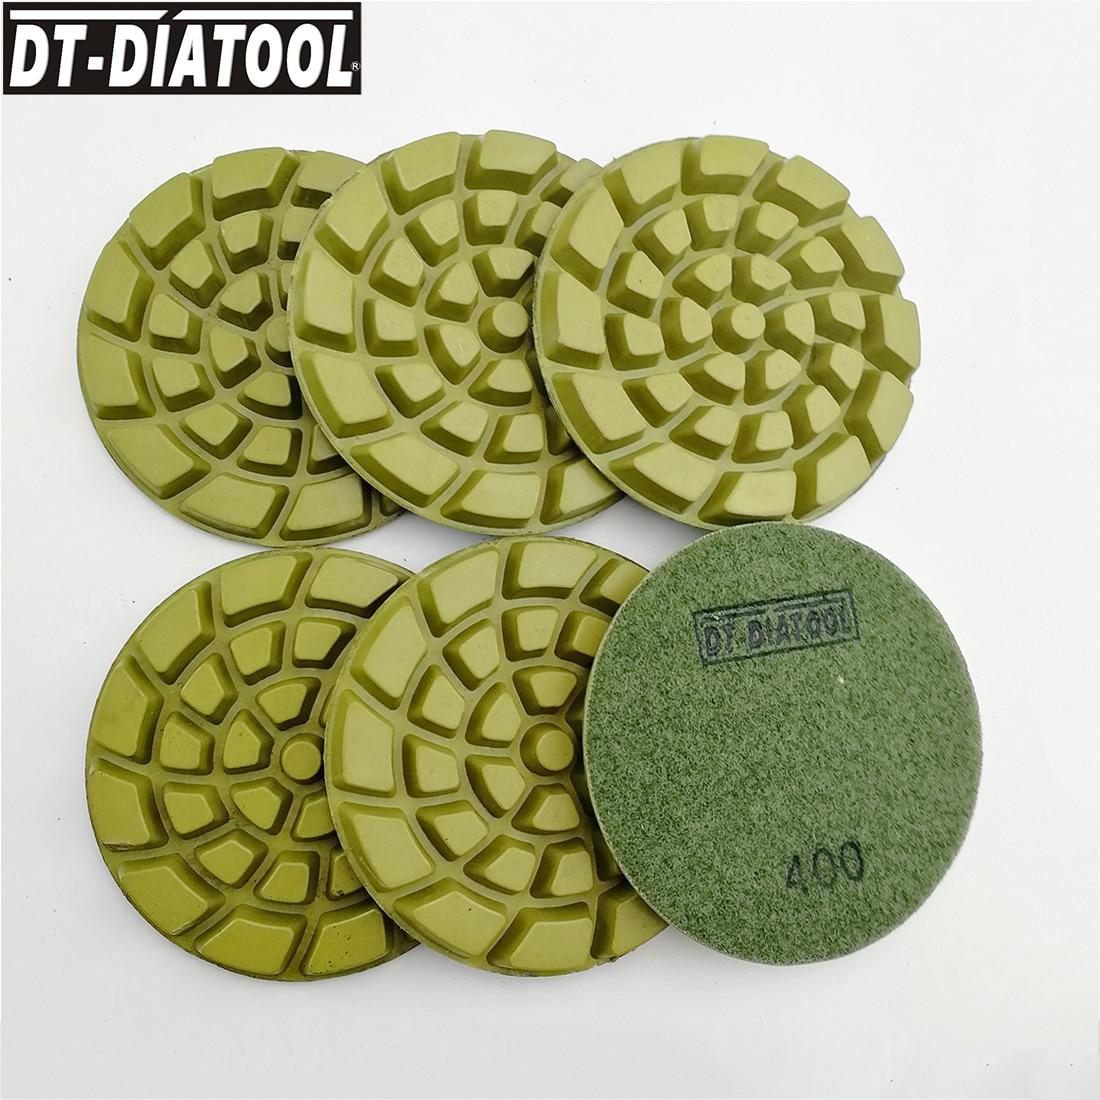 DT-DIATOOL 6 шт. диаметр 100 мм/4